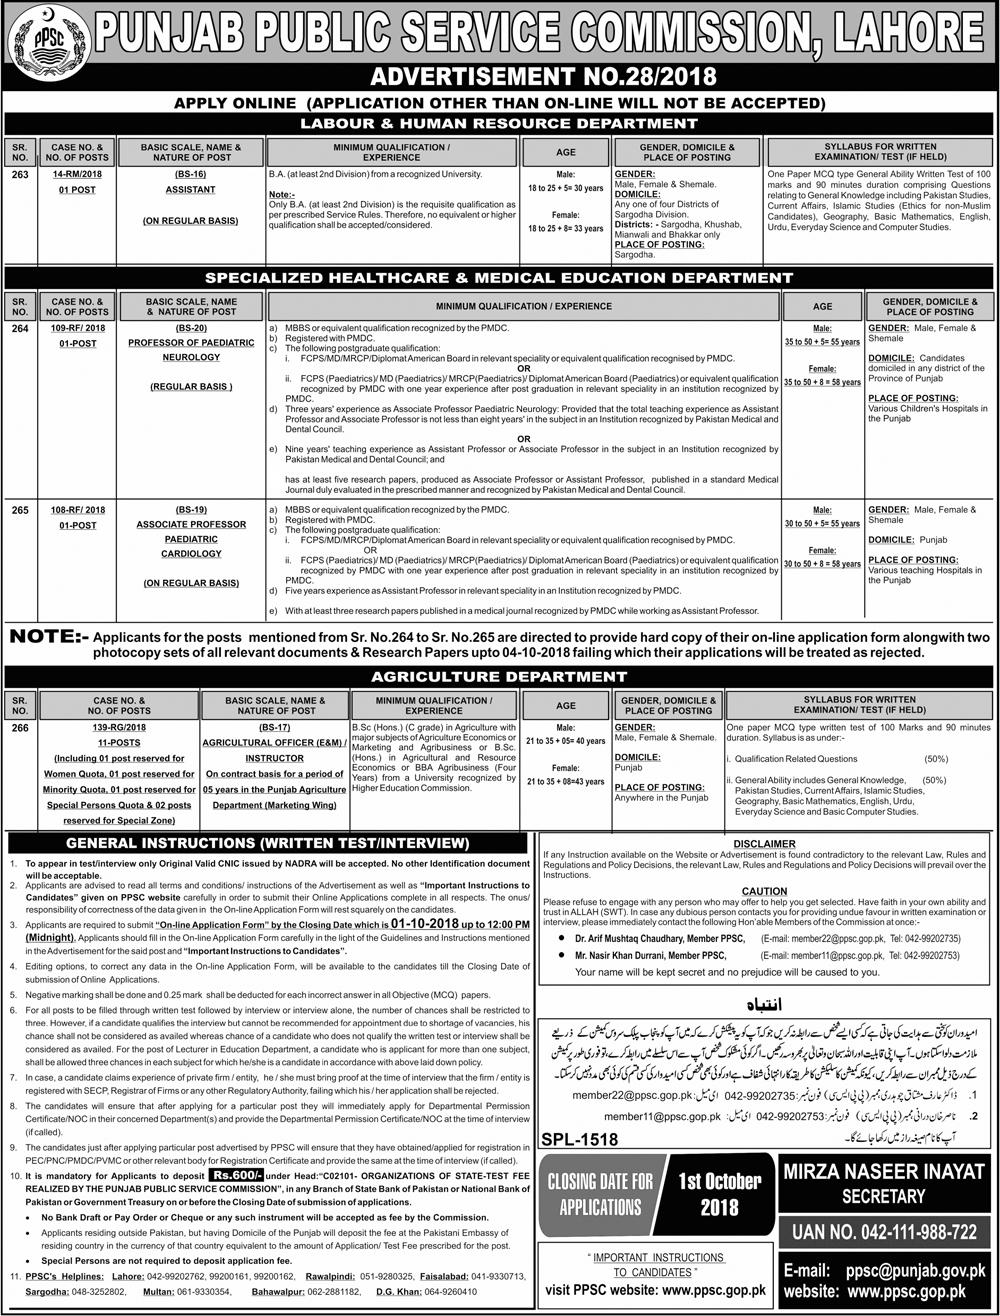 Latest Vacancies Announced in PPSC.GOP.PK Punjab Public Service Commission PPSC 16 September 2018